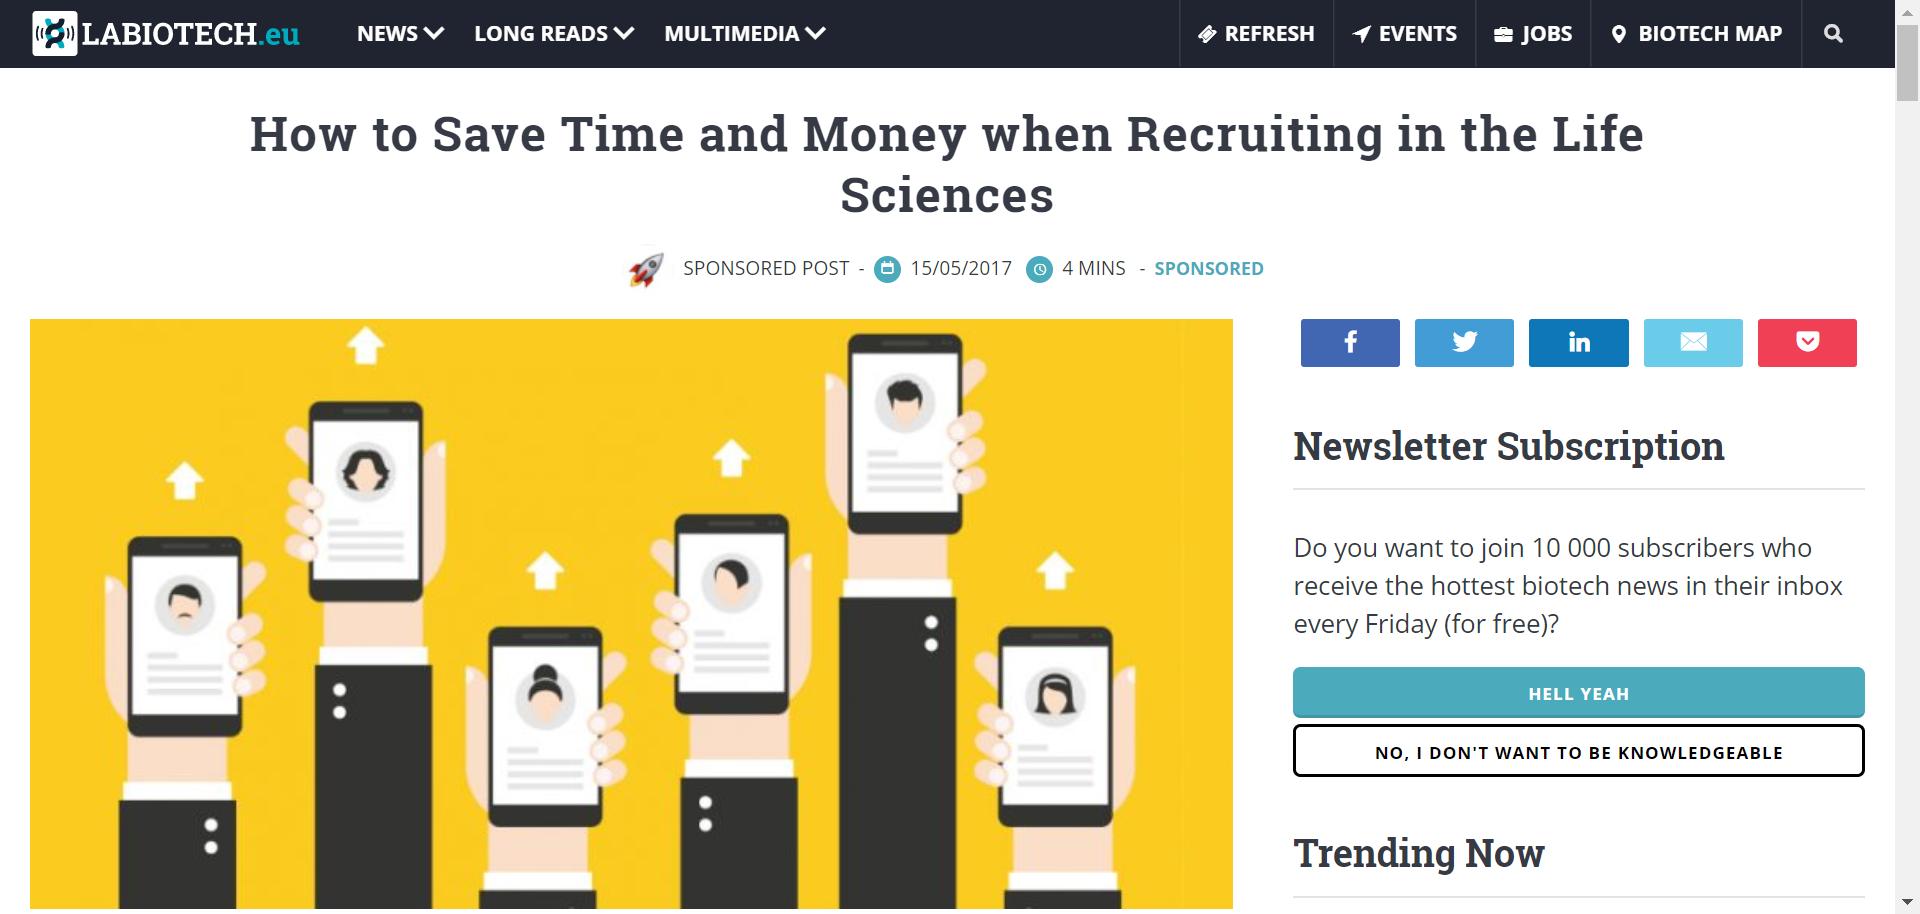 Sabine comments on life sciences recruitment